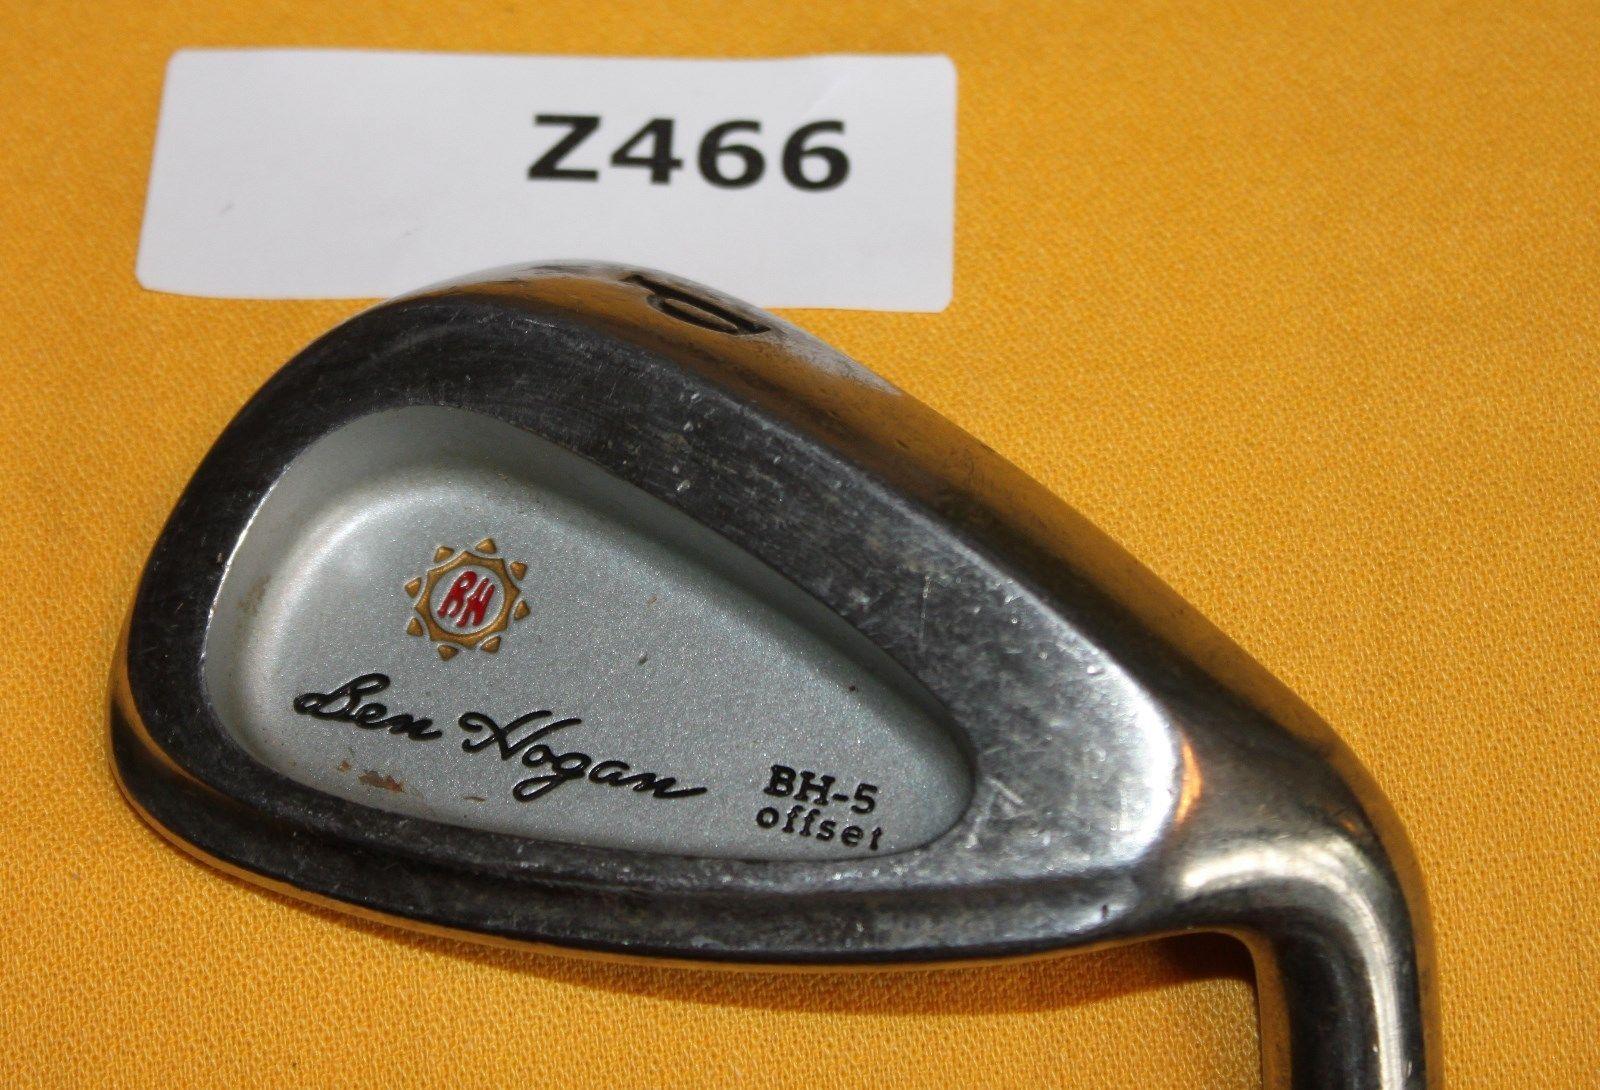 d6bf78ec7045 Ben Hogan BH-5 Offset P PW Pitching Wedge   3 Regular Steel Golf Club Z466x  (eBay Link)